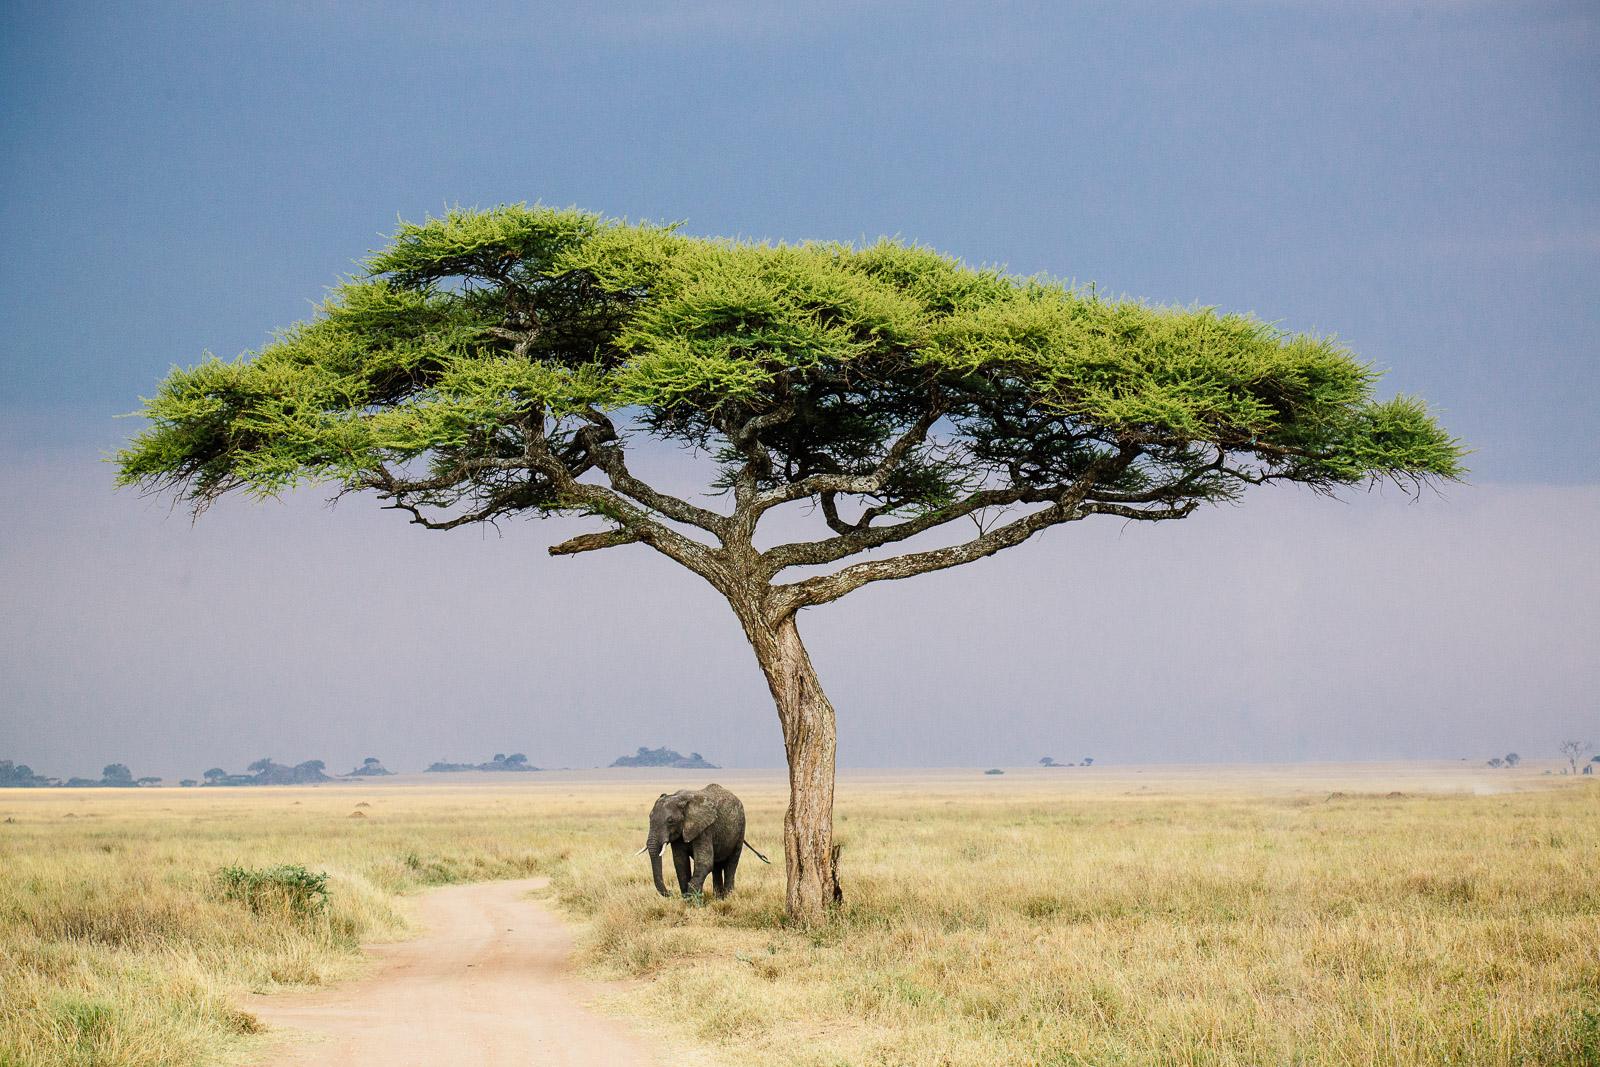 tanzania-africa-travel-photos-adventure-safari-6.jpg